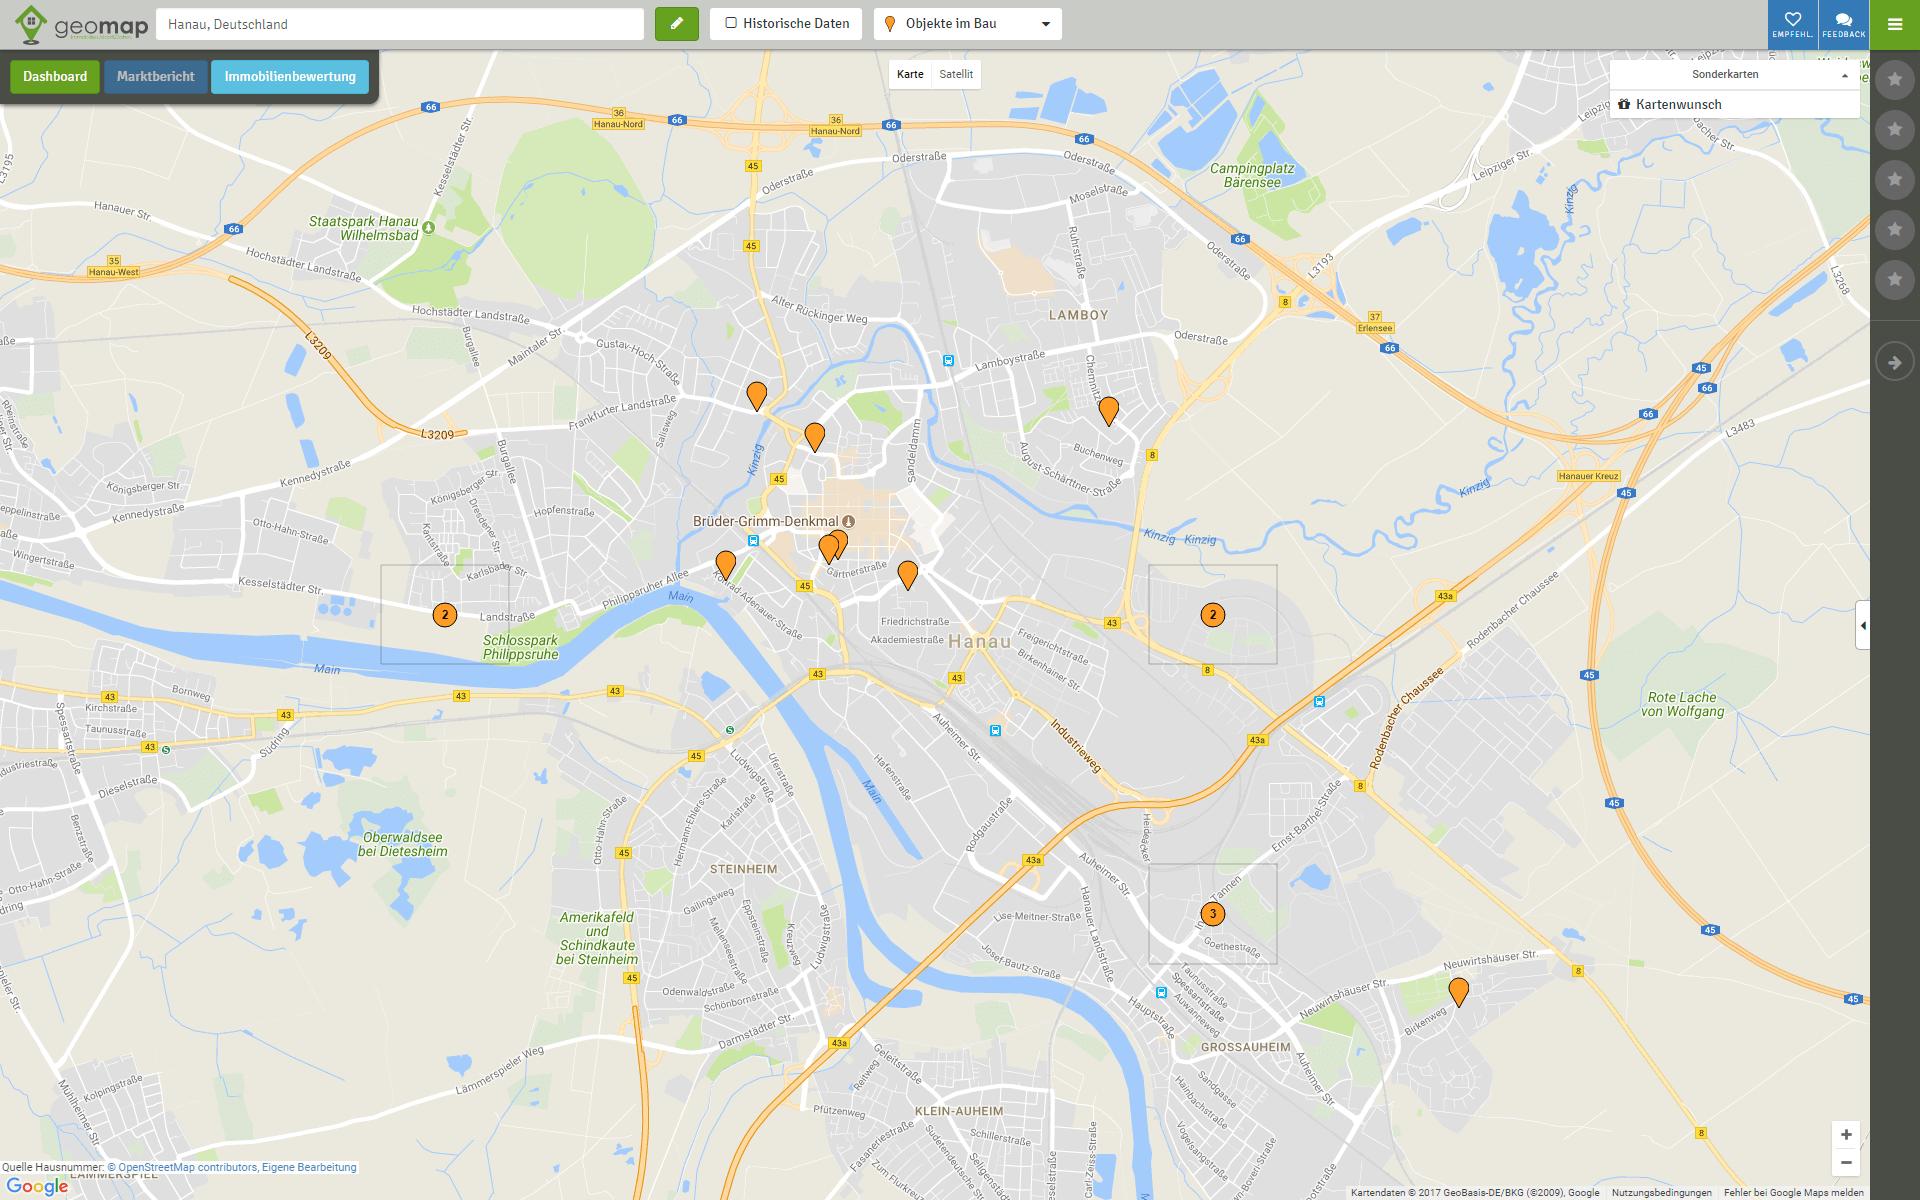 geomap-Objekte-im-Bau-Hanau